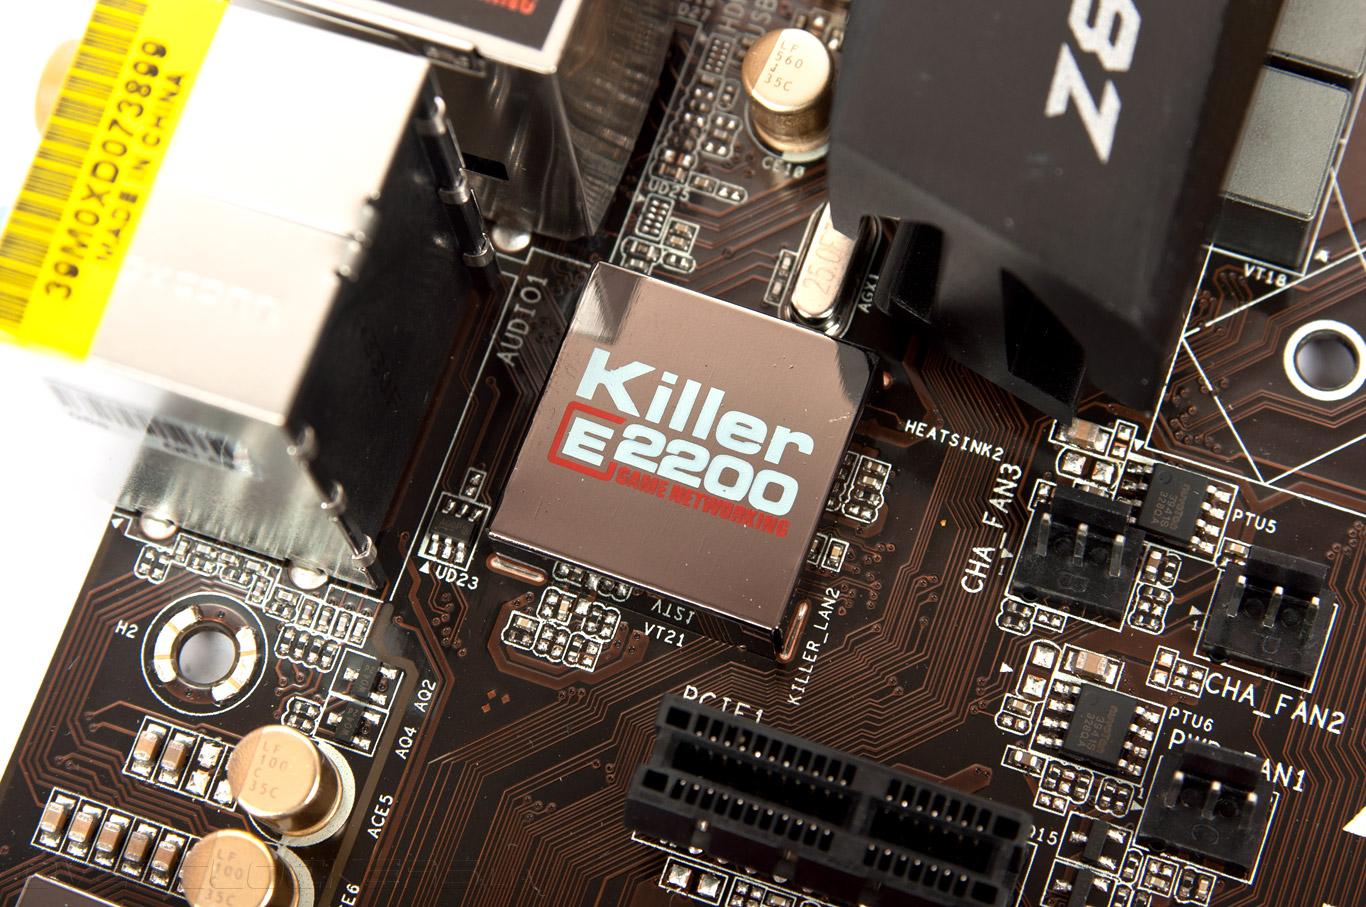 ASROCK FATAL1TY Z87 KILLER INTEL USB 3.0 DRIVERS FOR WINDOWS XP